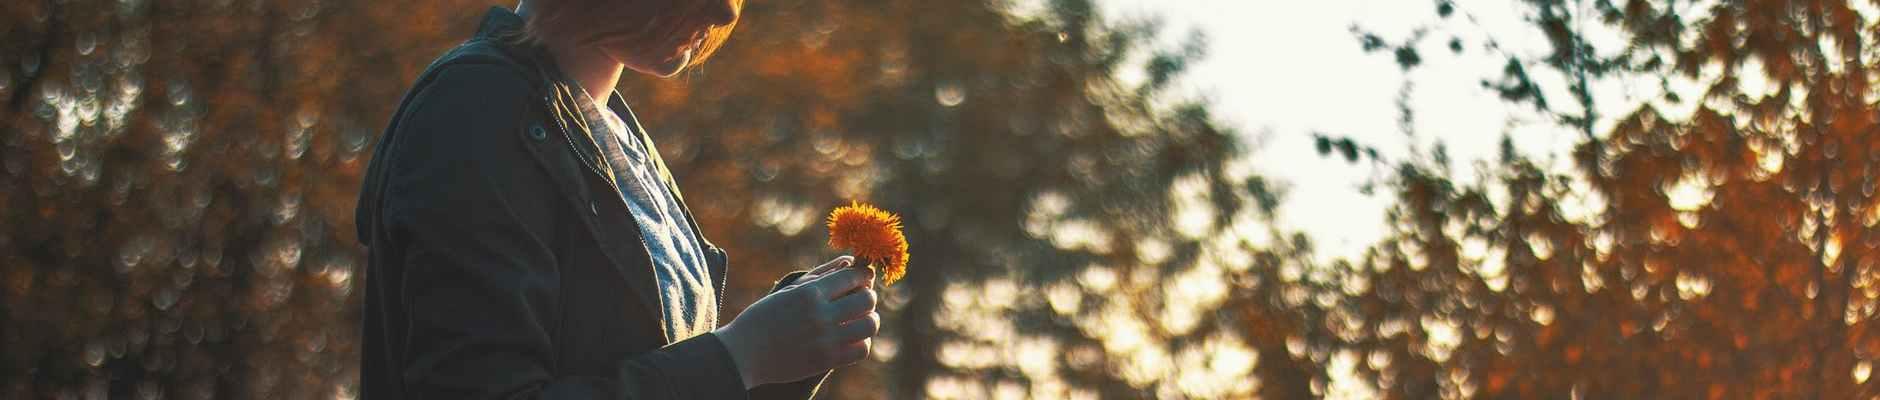 Sreća dolazi iznutra..., Selo i selske priče ili kako ljudi mogu biti zatucana zlopamtila